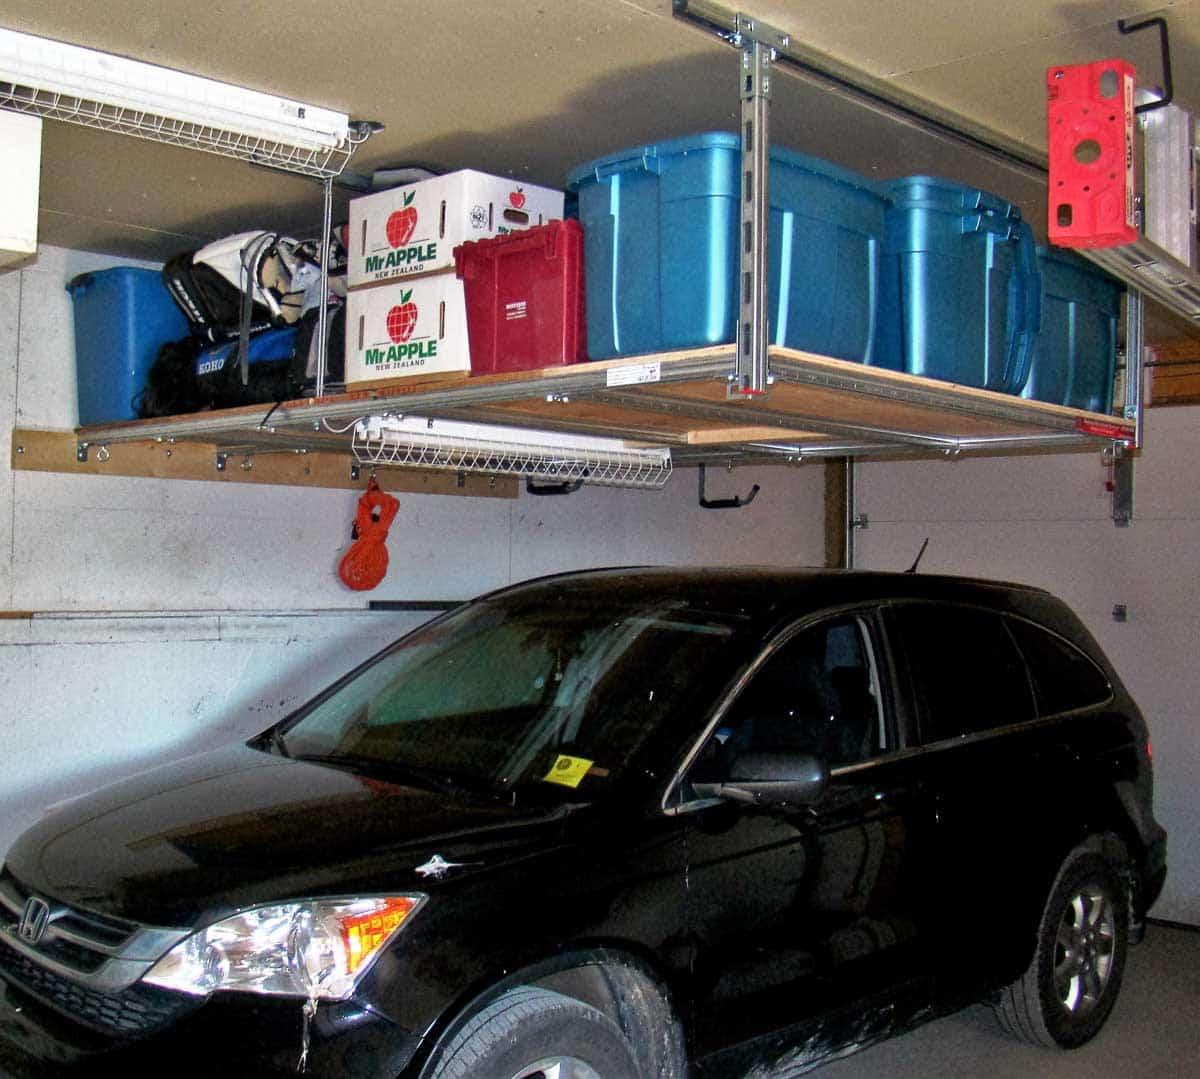 Storage Above. Cars Below